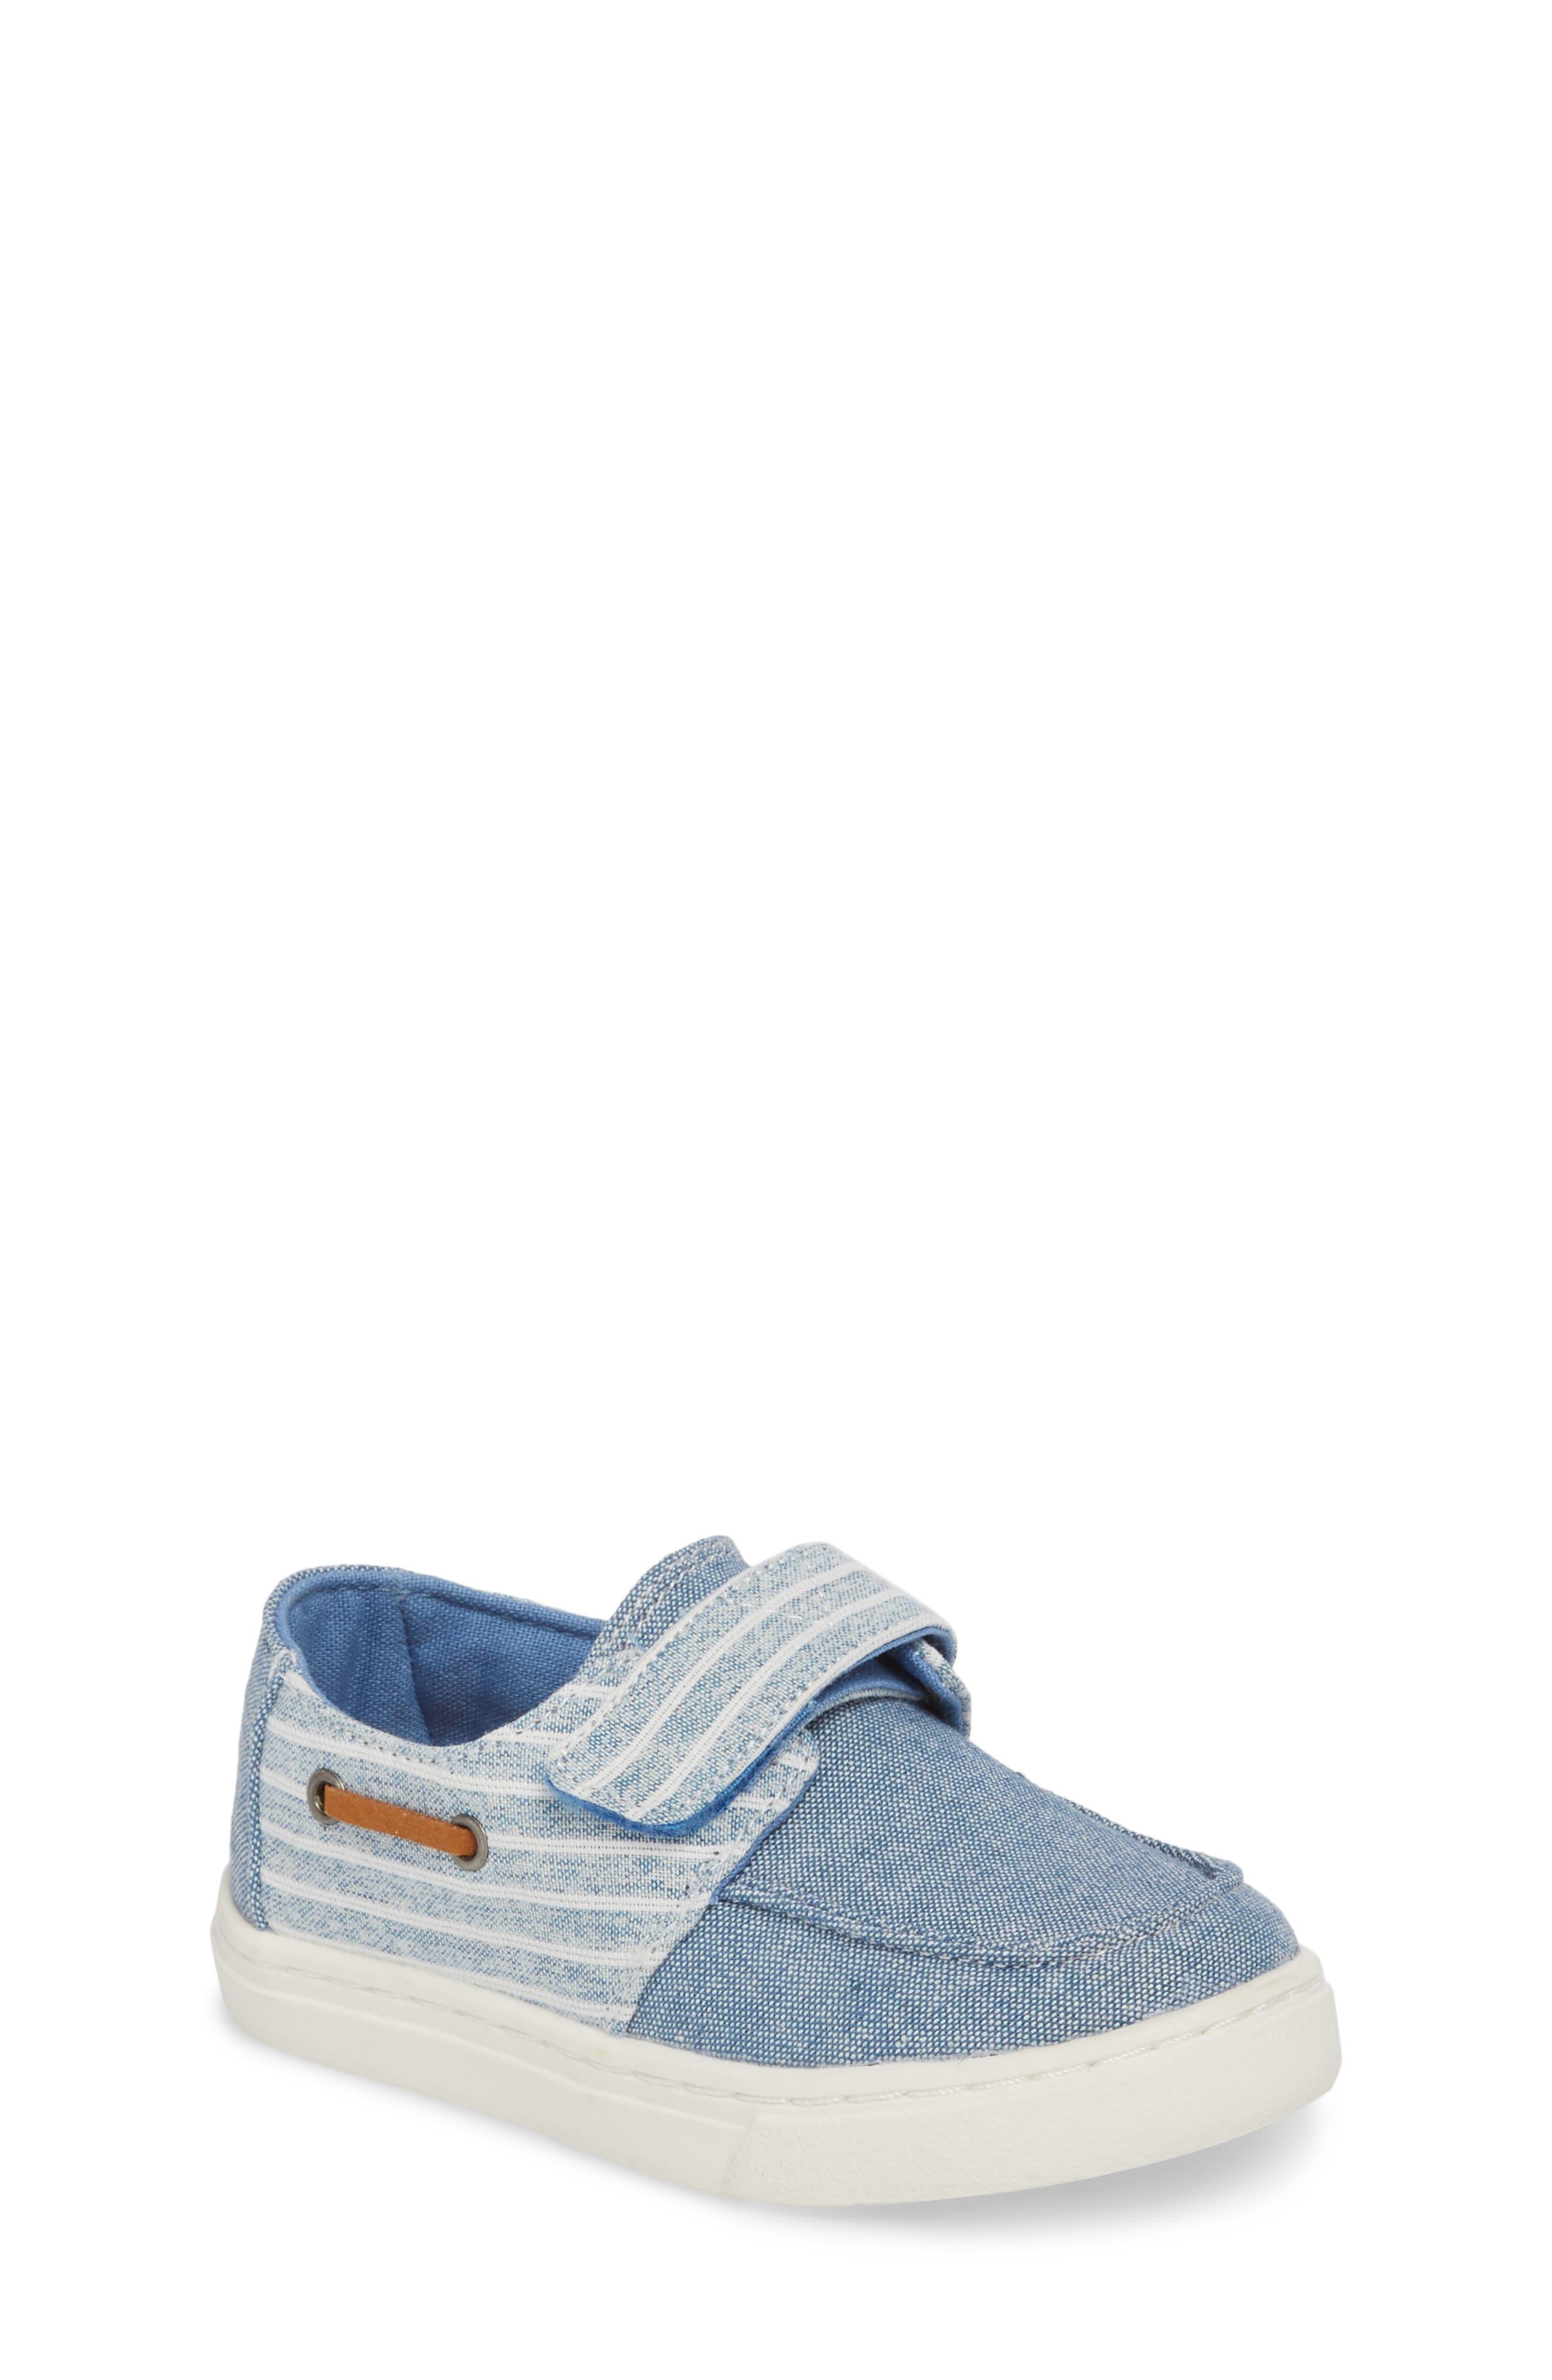 Culver Boat Shoe,                             Main thumbnail 1, color,                             BLUE CHAMBRAY/ STRIPE